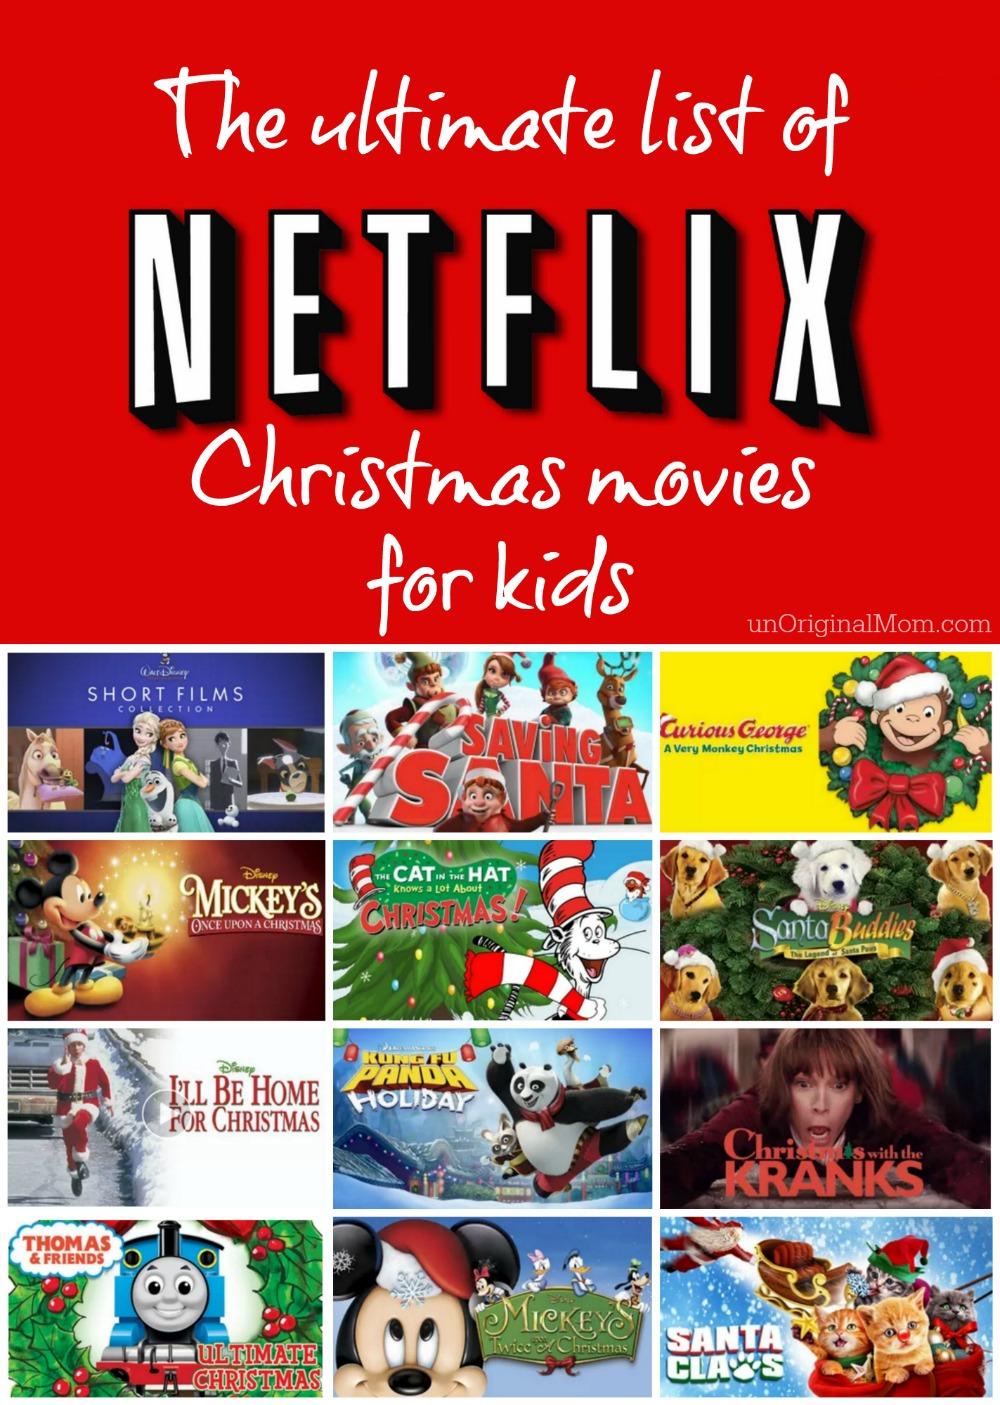 Netflix Christmas Movies For Kids Unoriginal Mom,Personalized Birthday Gift Ideas For Boyfriend